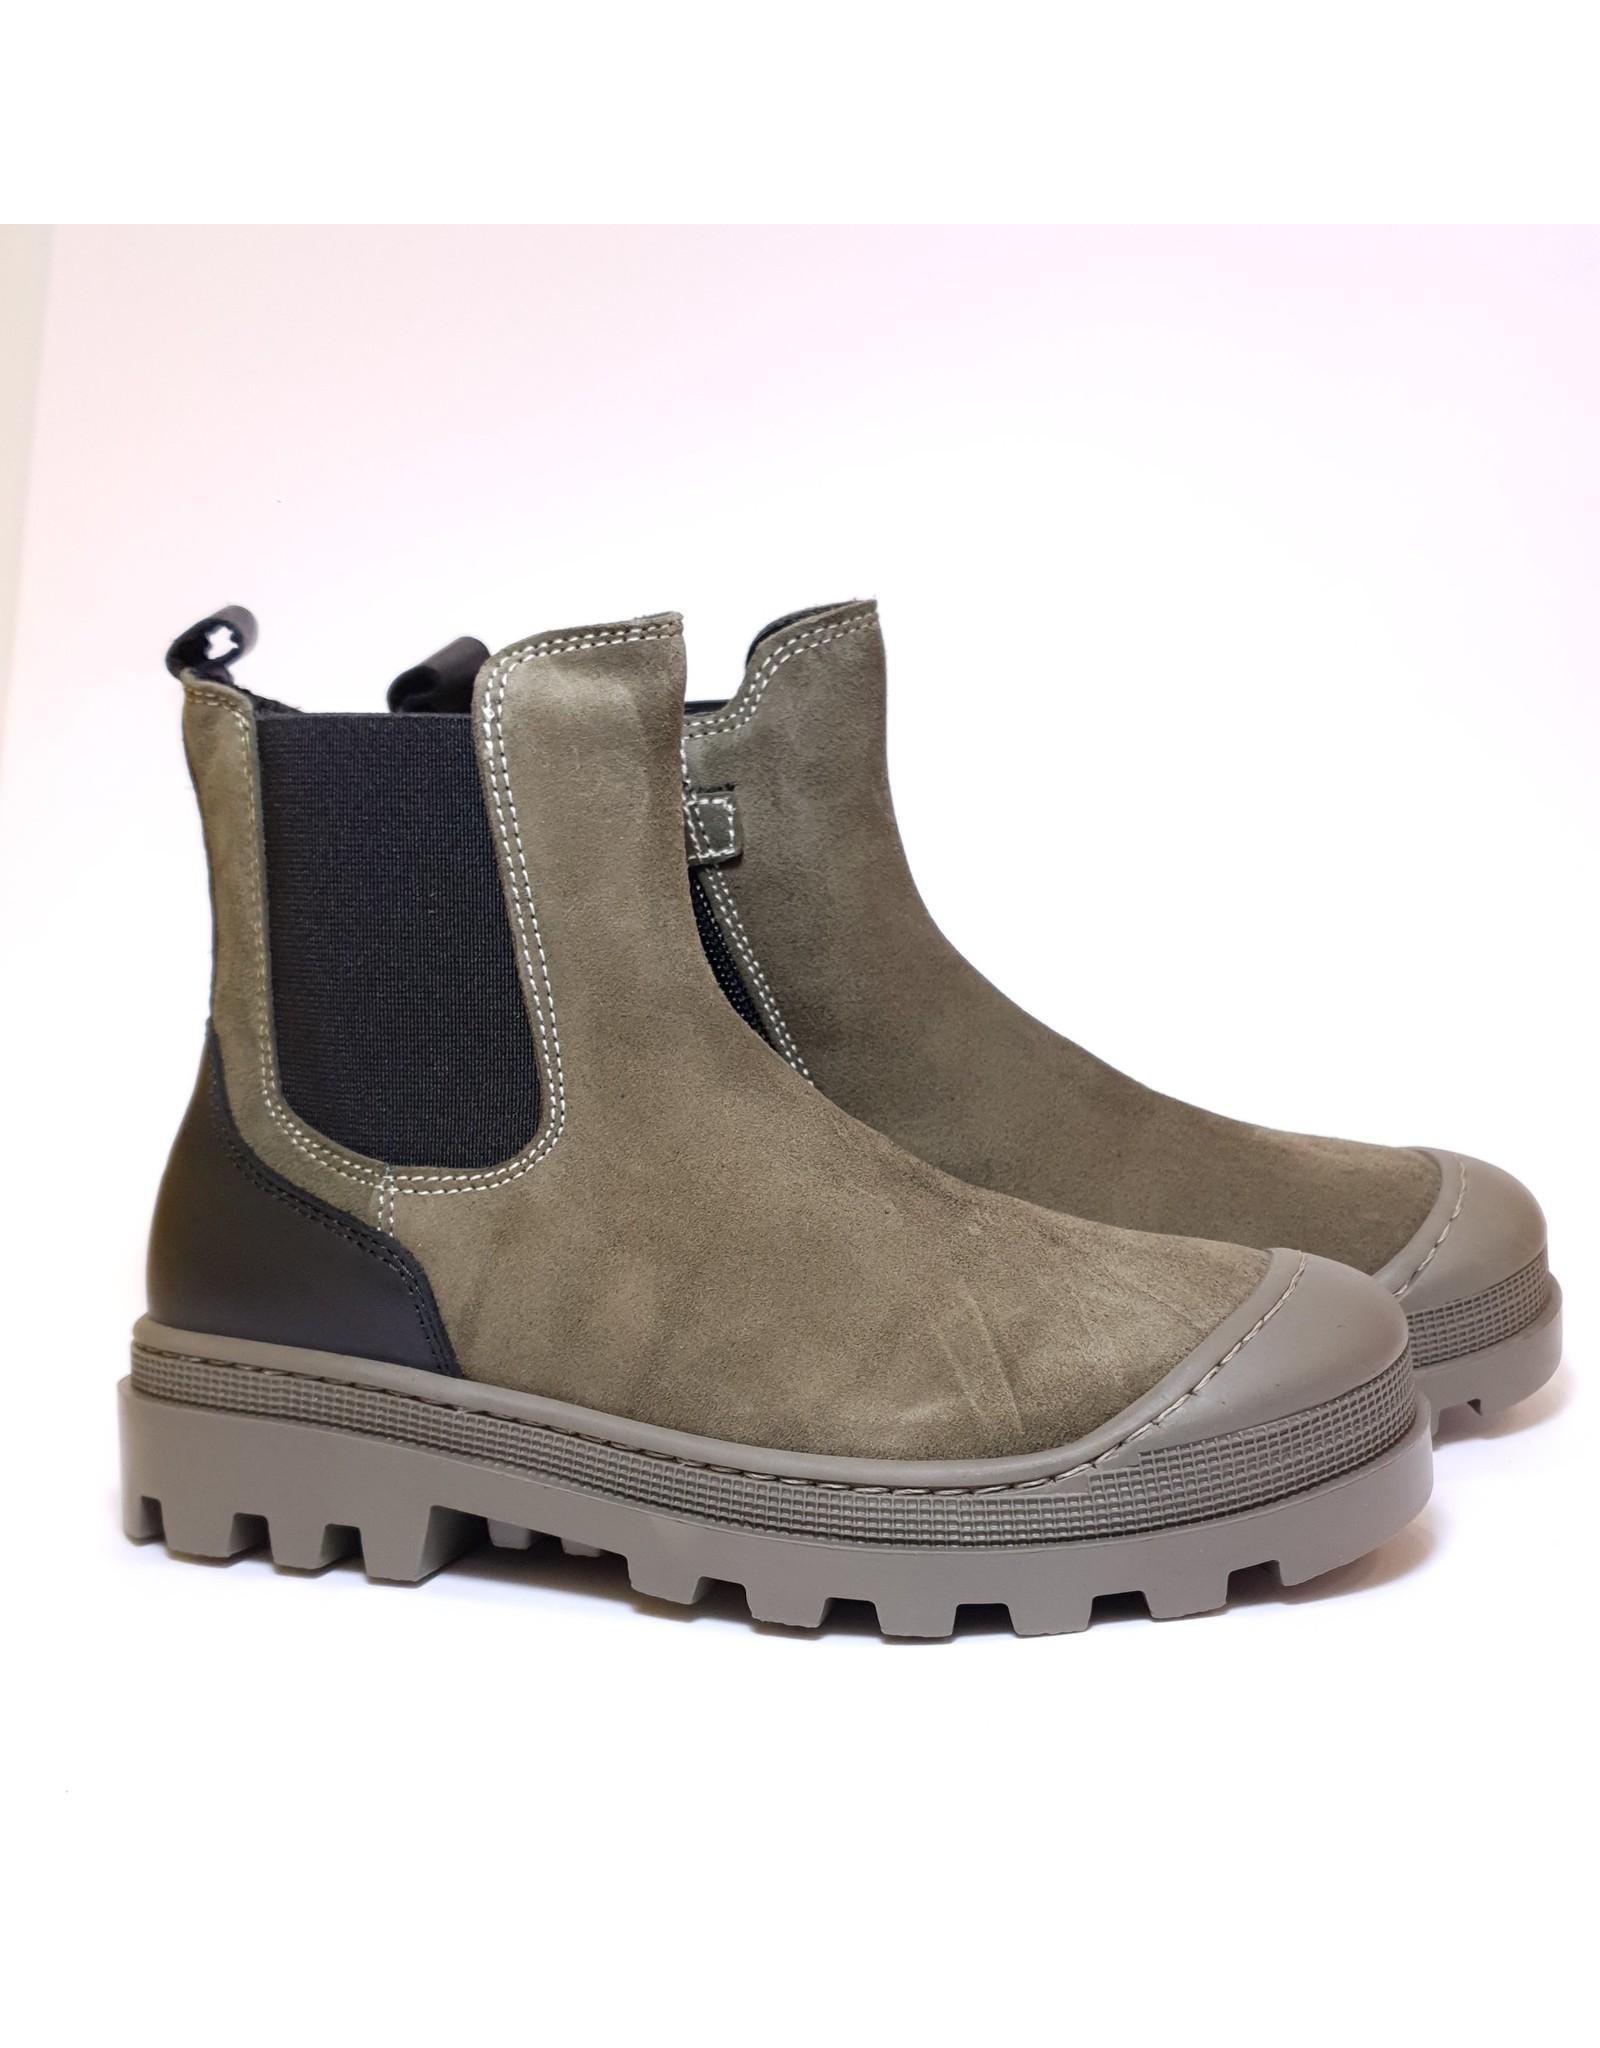 Andrea Morelli Boot kaki black